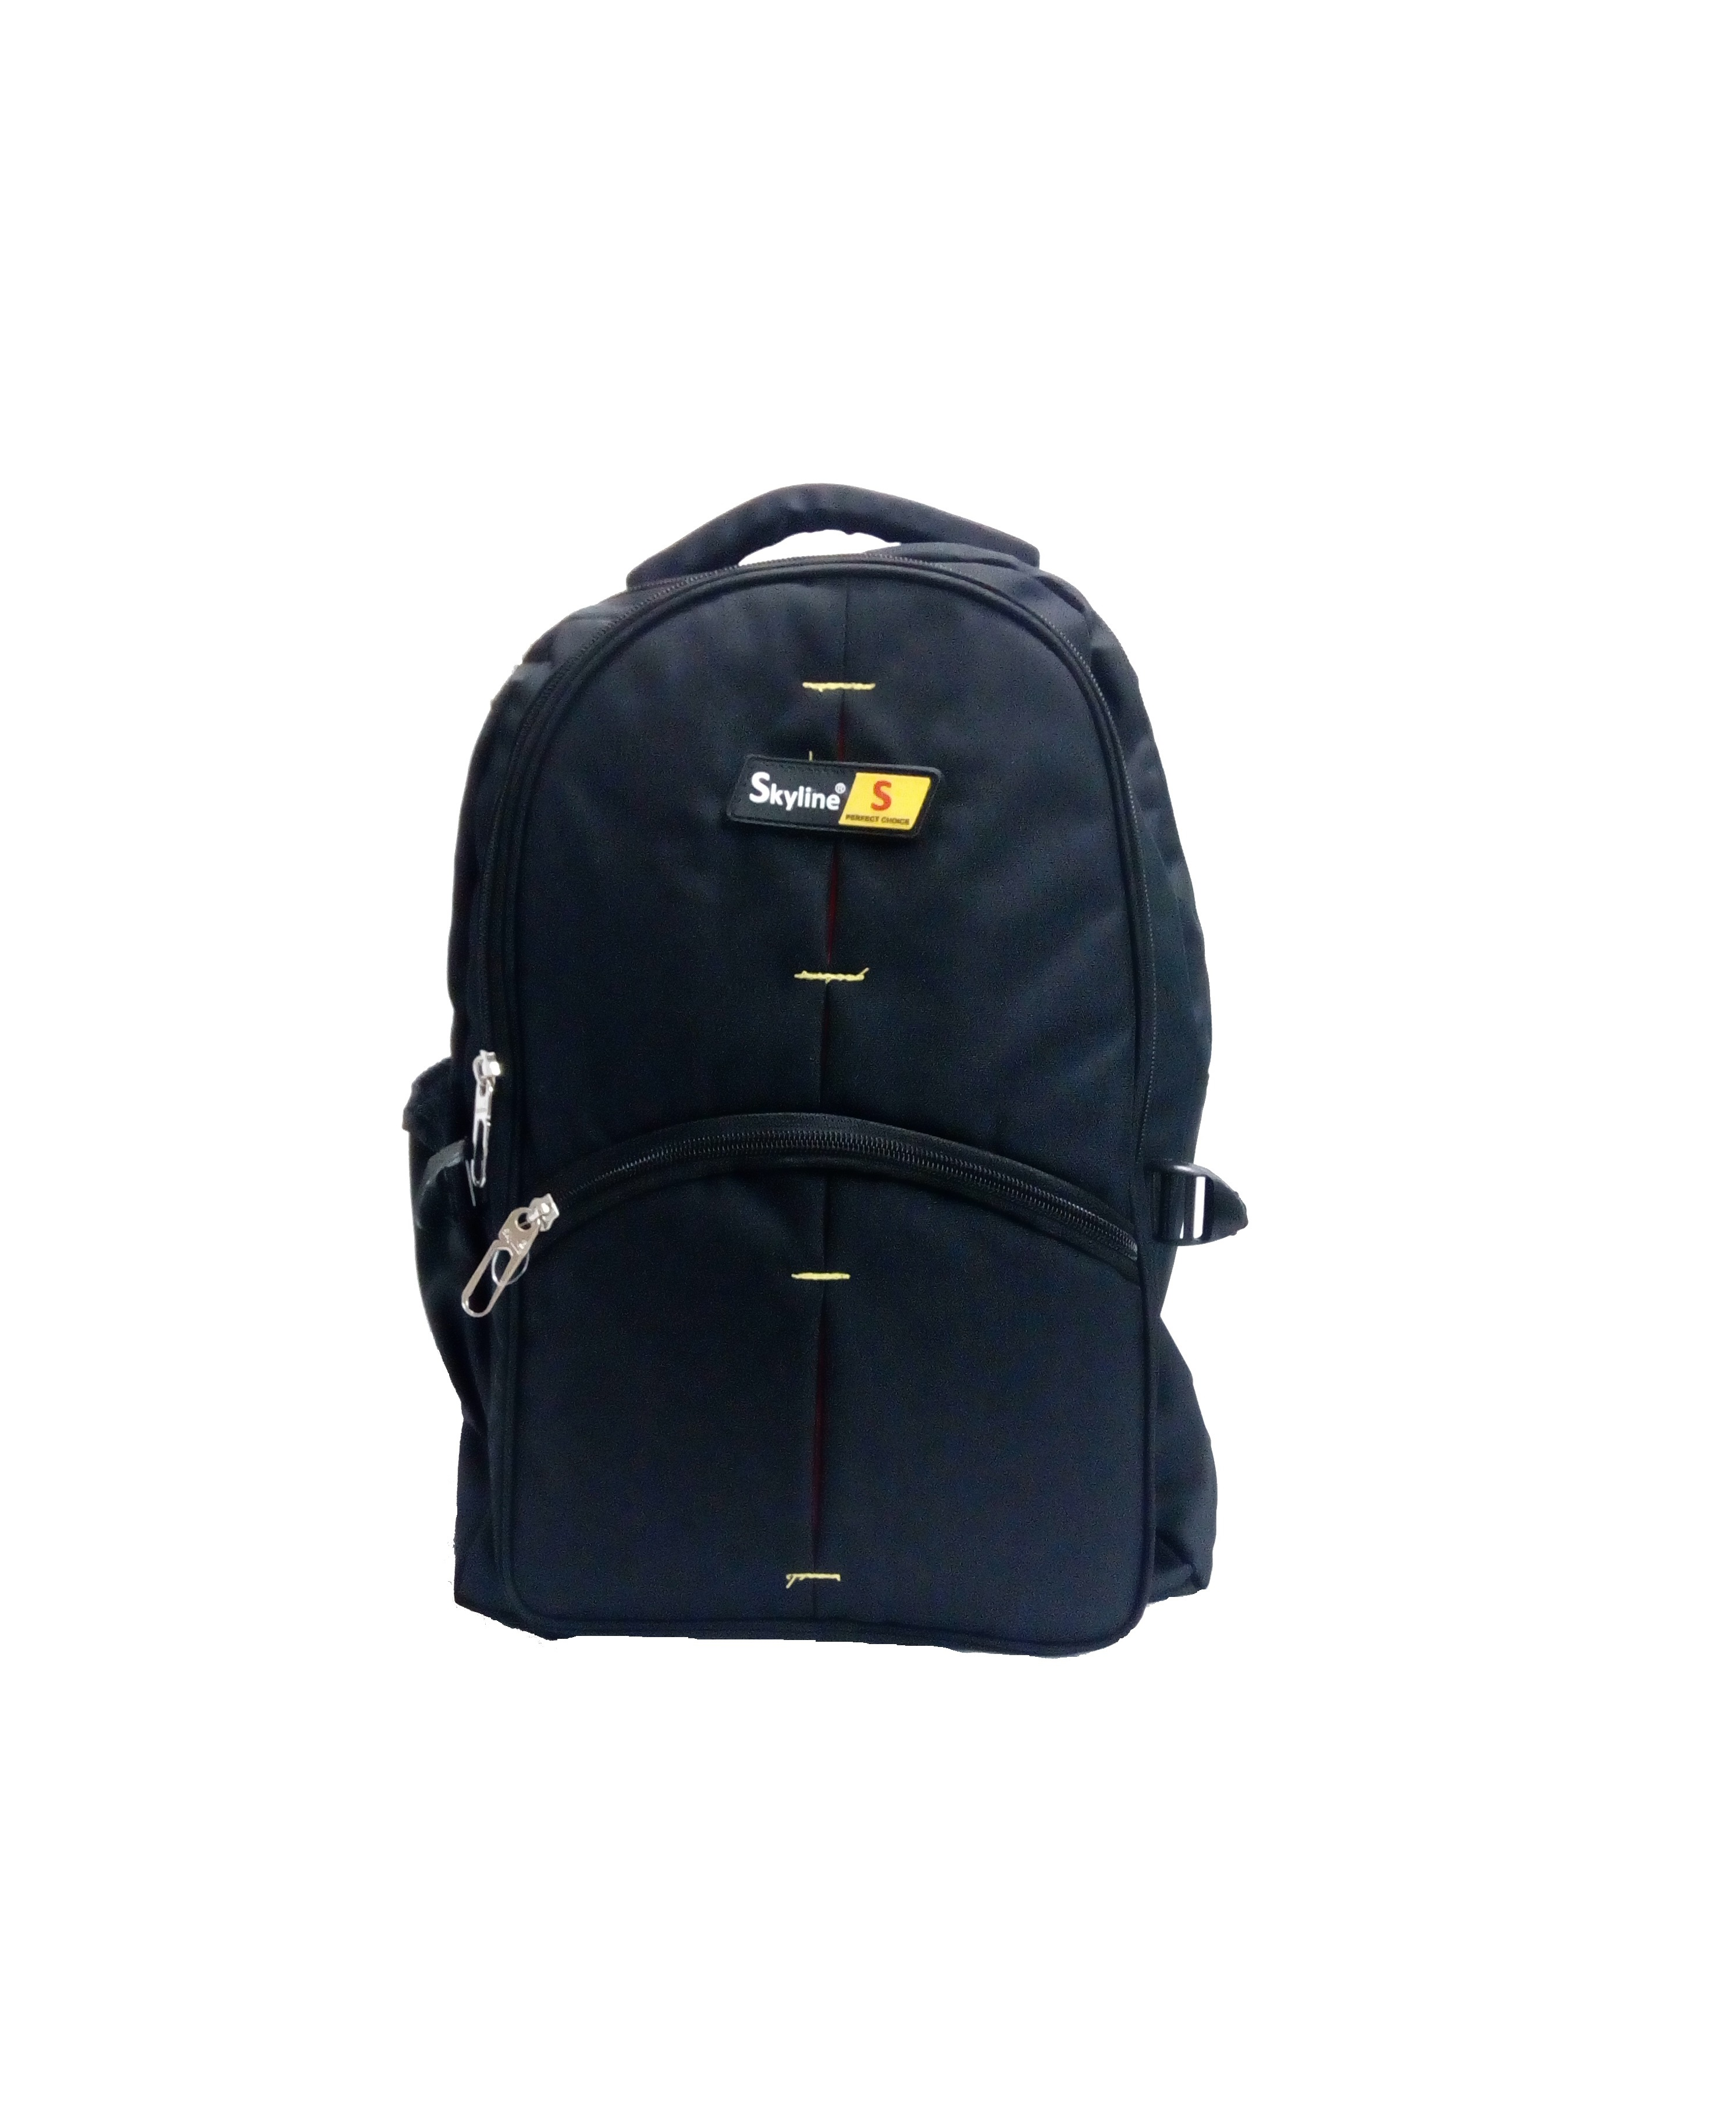 Skyline College/School/Office Backpack Bag Black  With Warranty 505